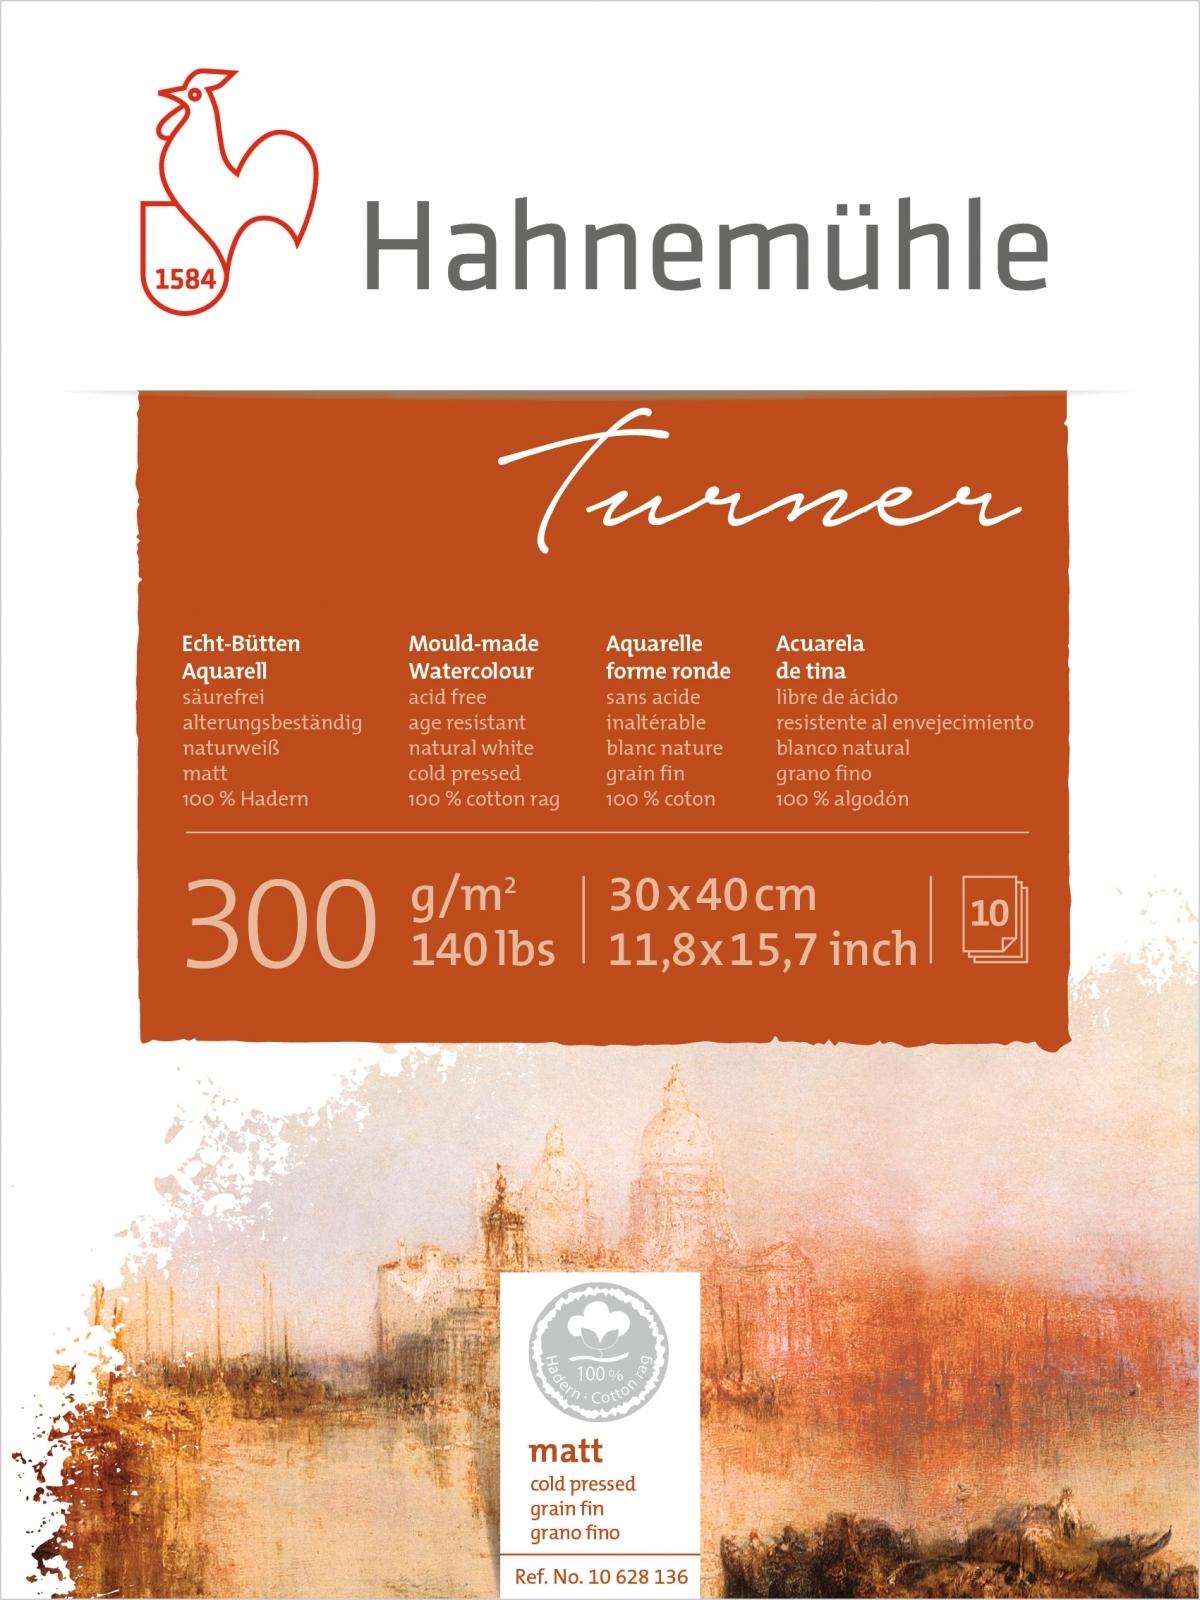 Papel Hahnemuhle William Turner Textura Fina 300g/m2 30x40 10fls (10628136) - Papelaria Botafogo